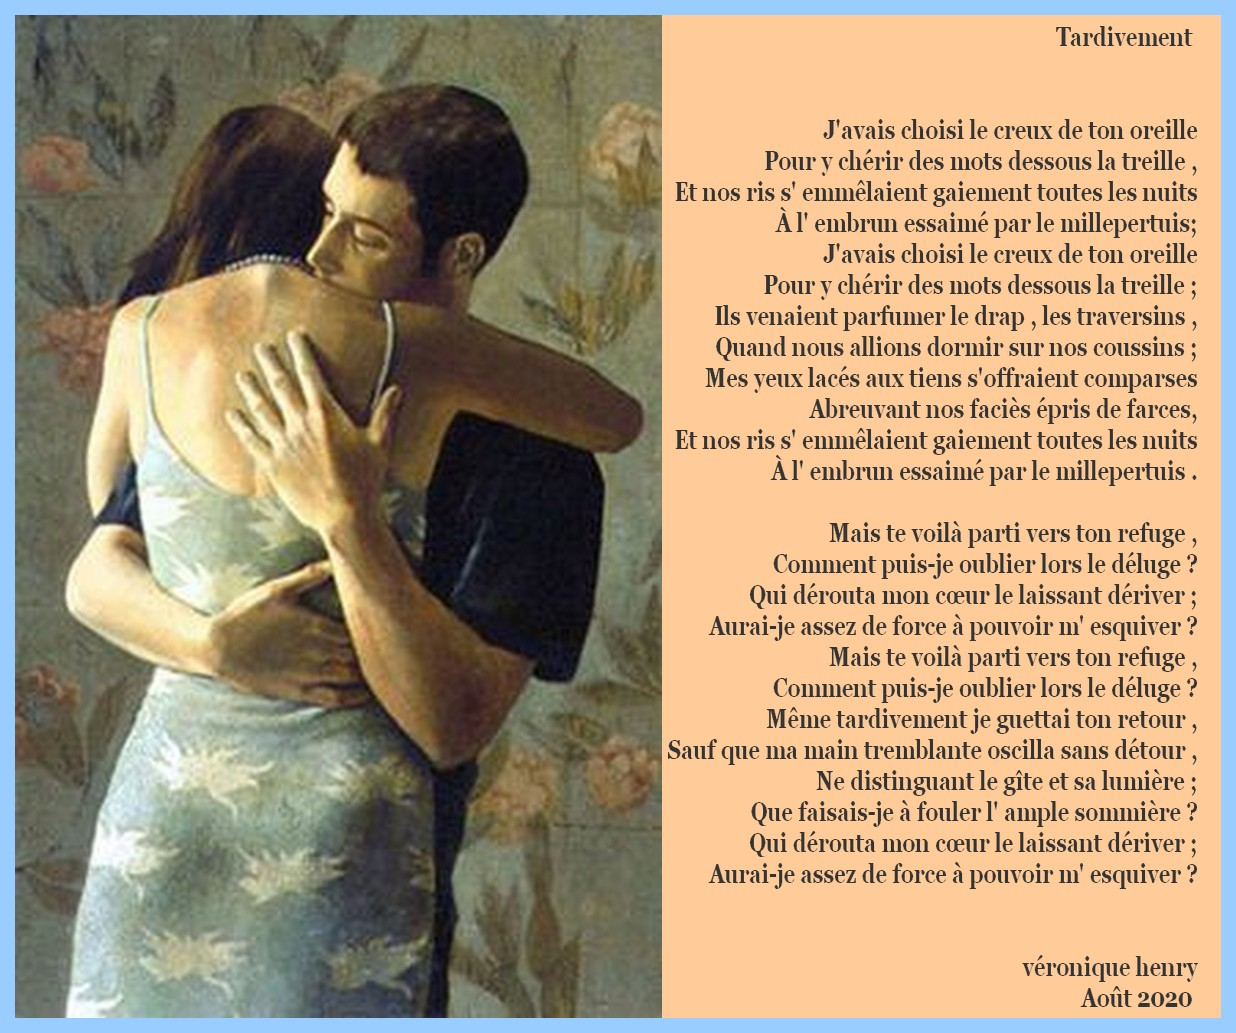 b47562a34c088afa50d3baac67b4276d--art-couple-beautiful-paintings